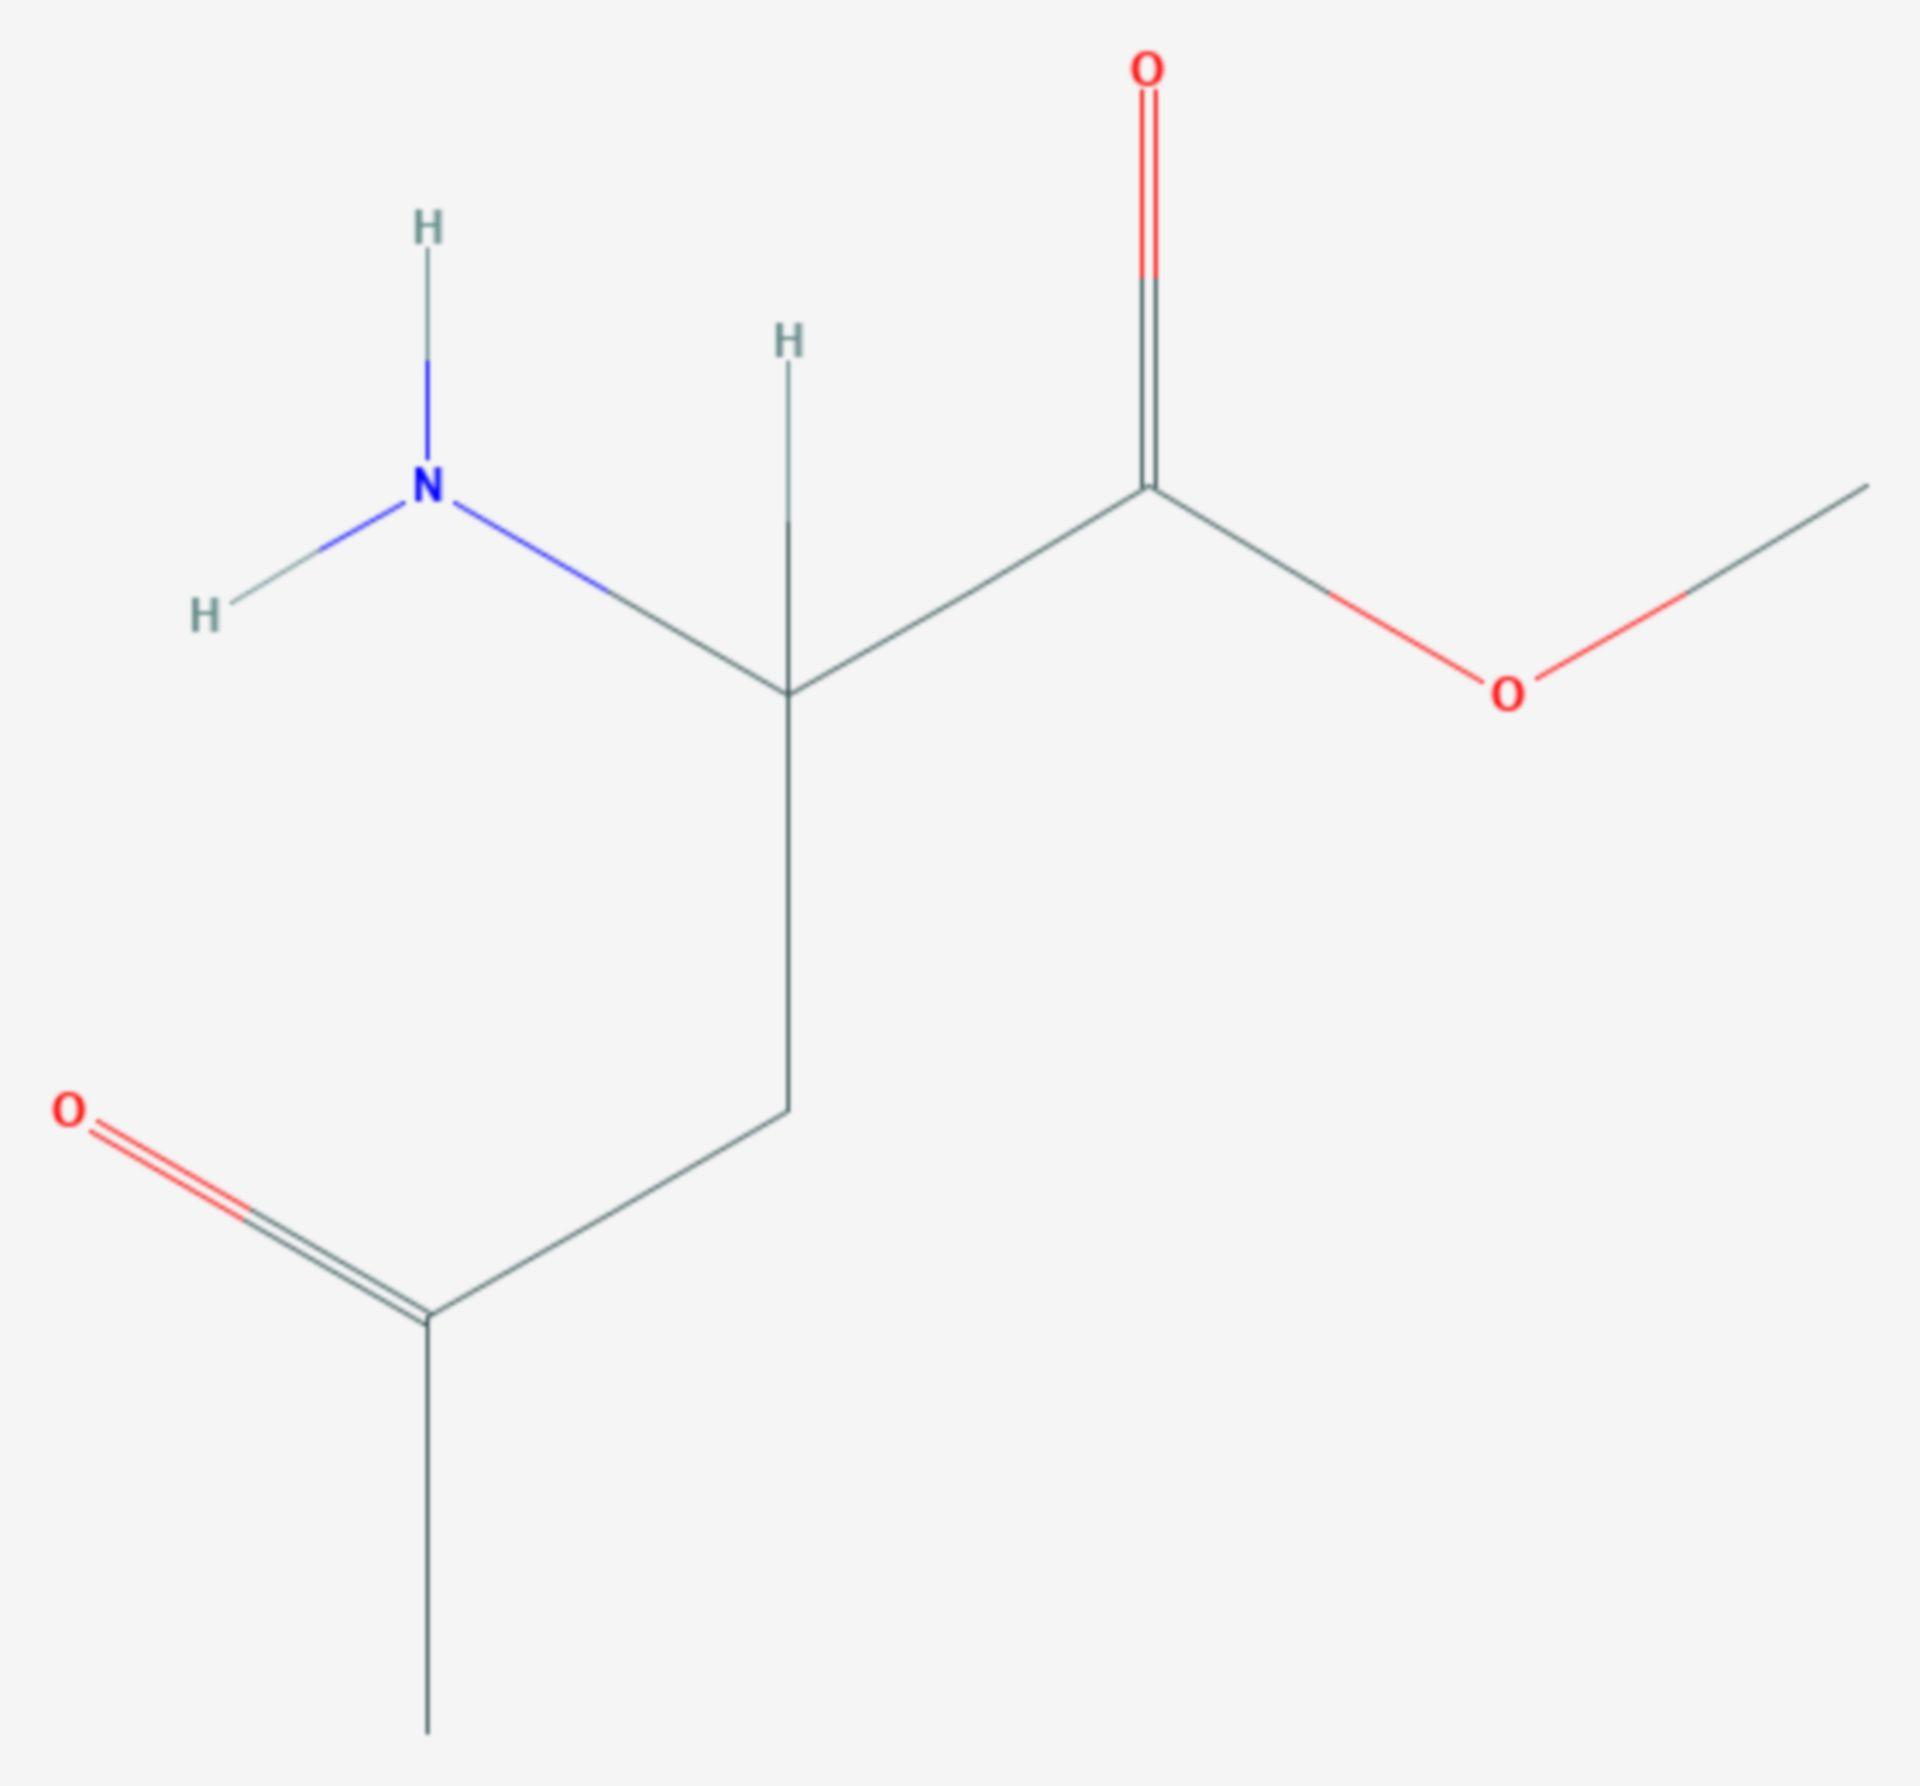 Methyl-5-amino-4-oxopentanoat (Strukturformel)